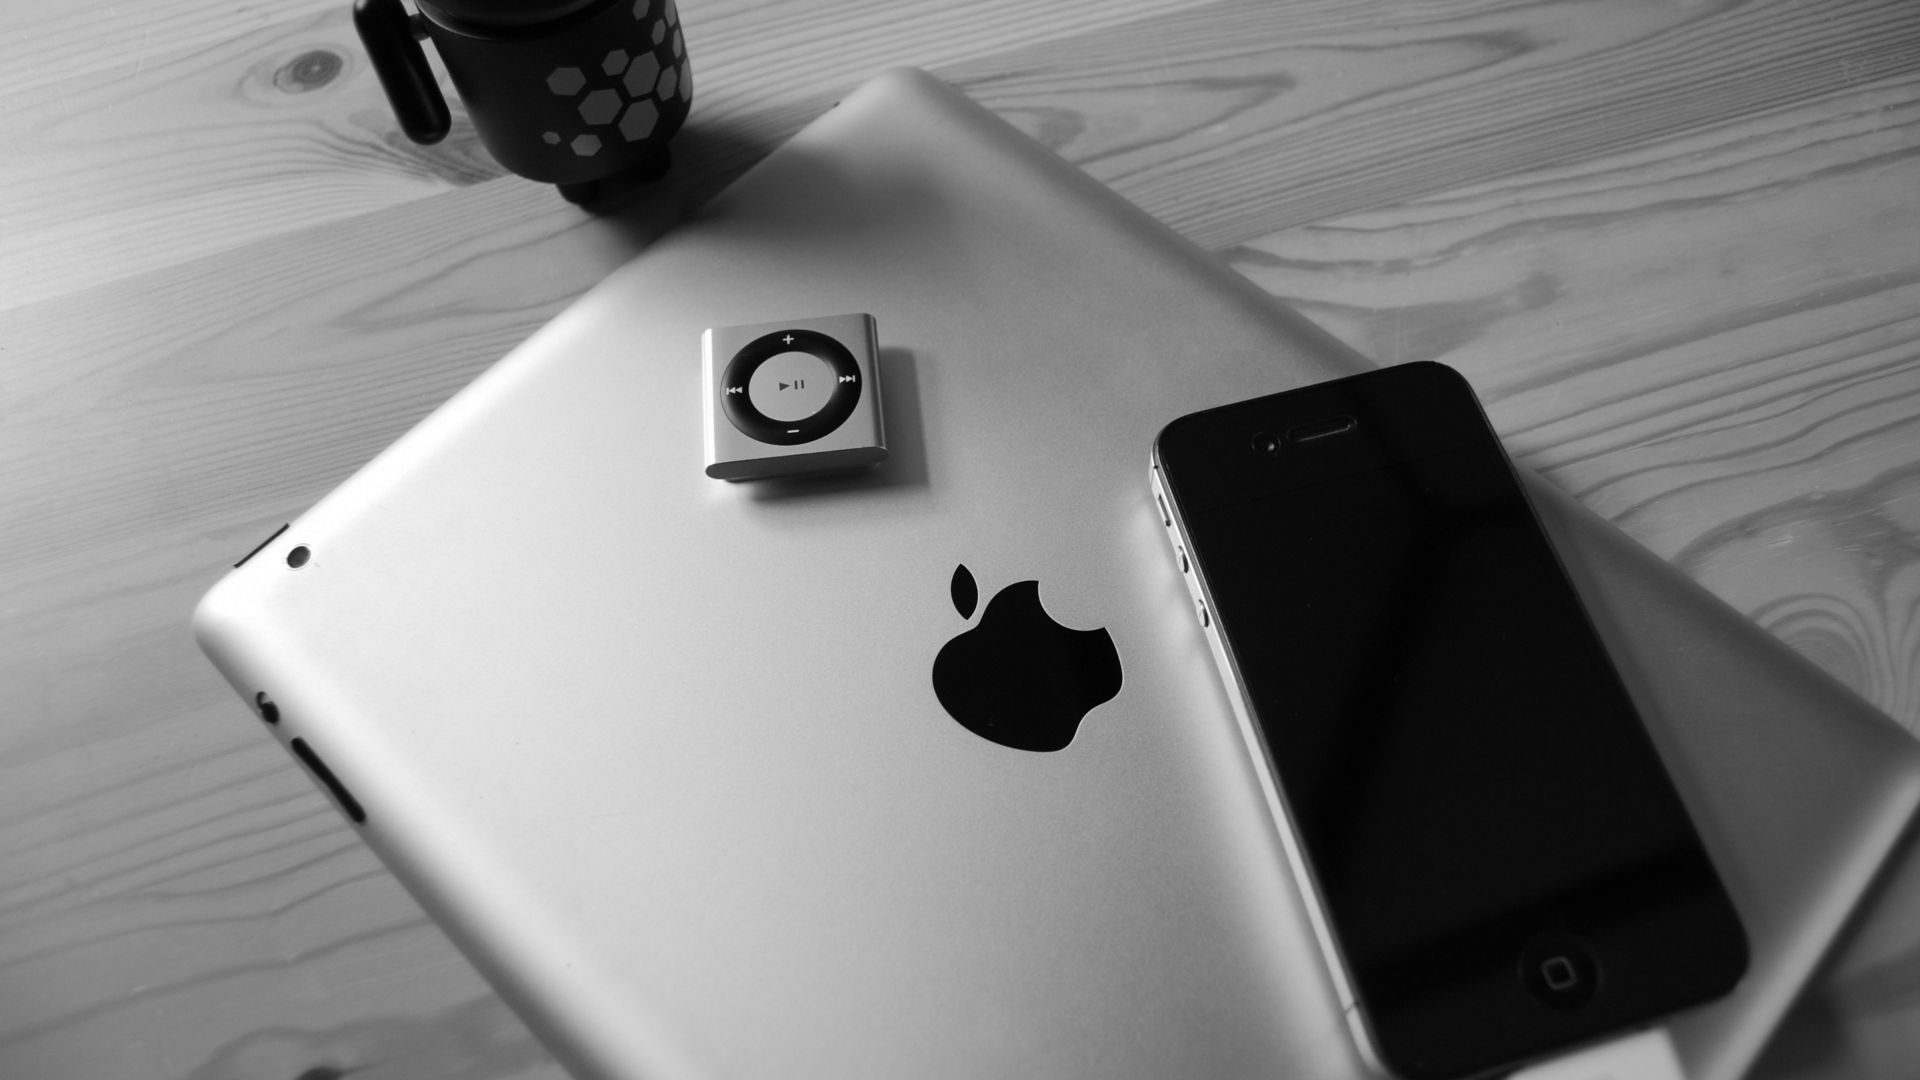 Apple Ipad wallpaper background